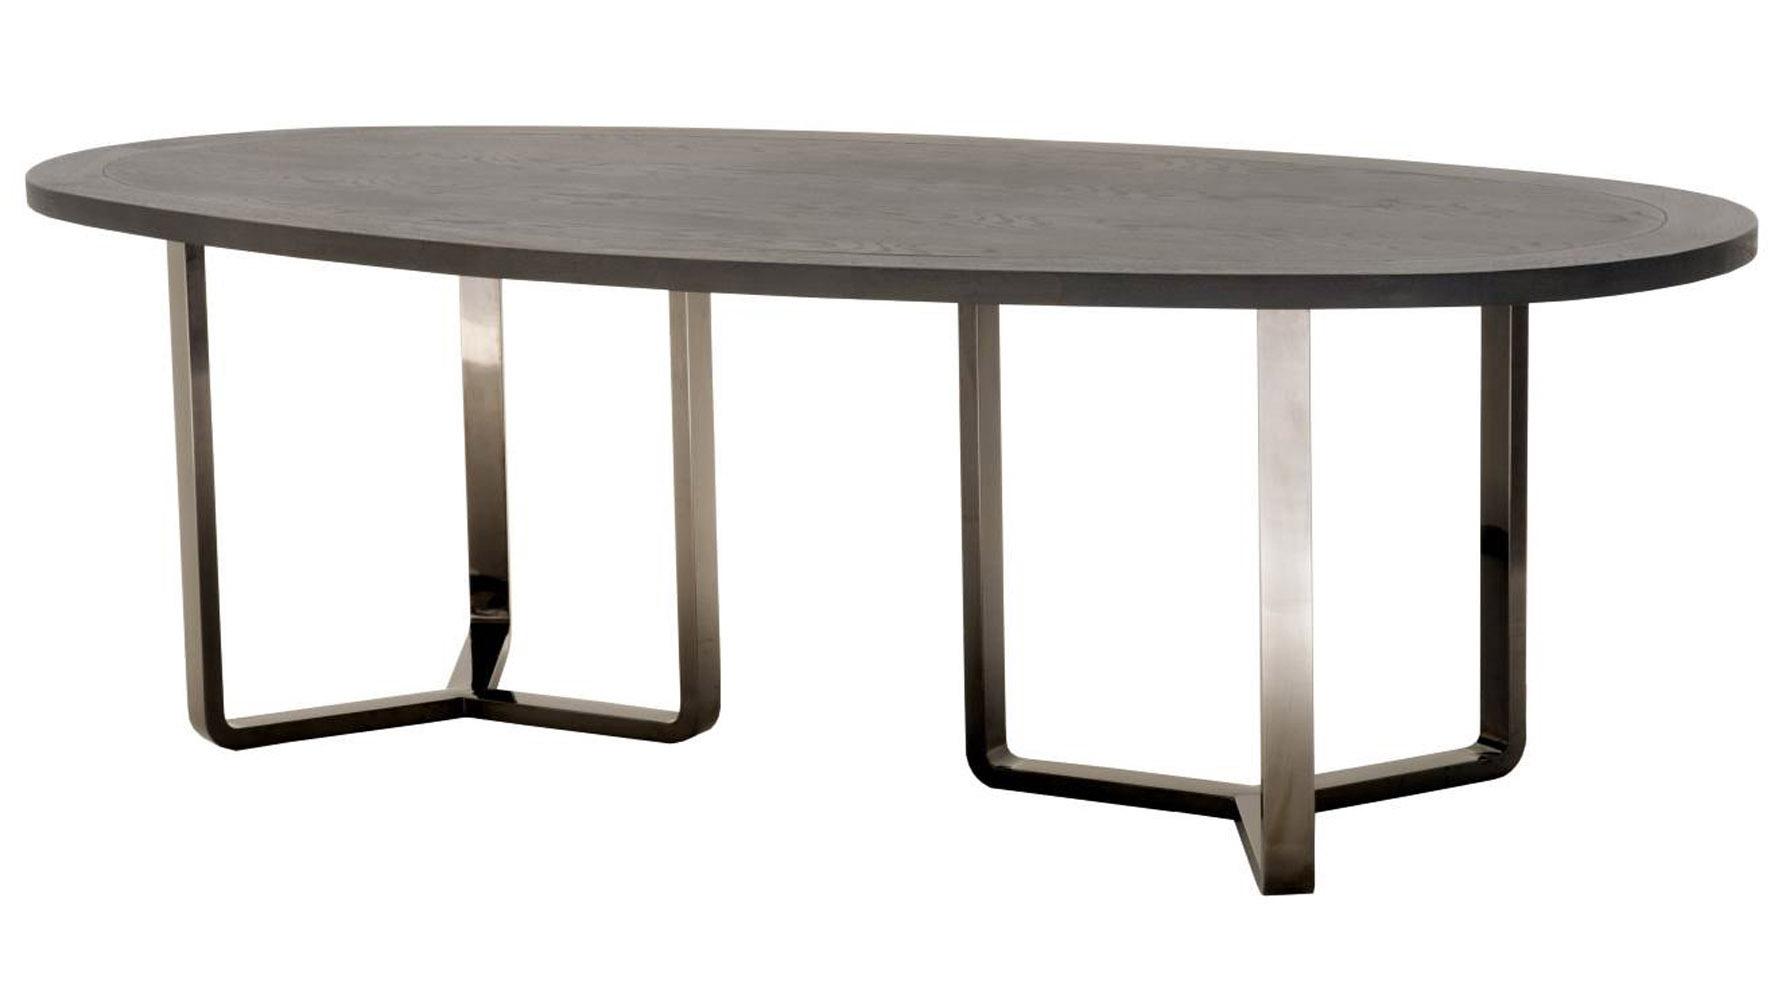 Sleek Stainless Steel Black Zurifurniture Jaffa Oval Oak Table Stainless Steel Black Zuri Oak Table Jaffa Oval Oak Table Leaf Oak Table Osrs houzz-03 Oak Dining Table